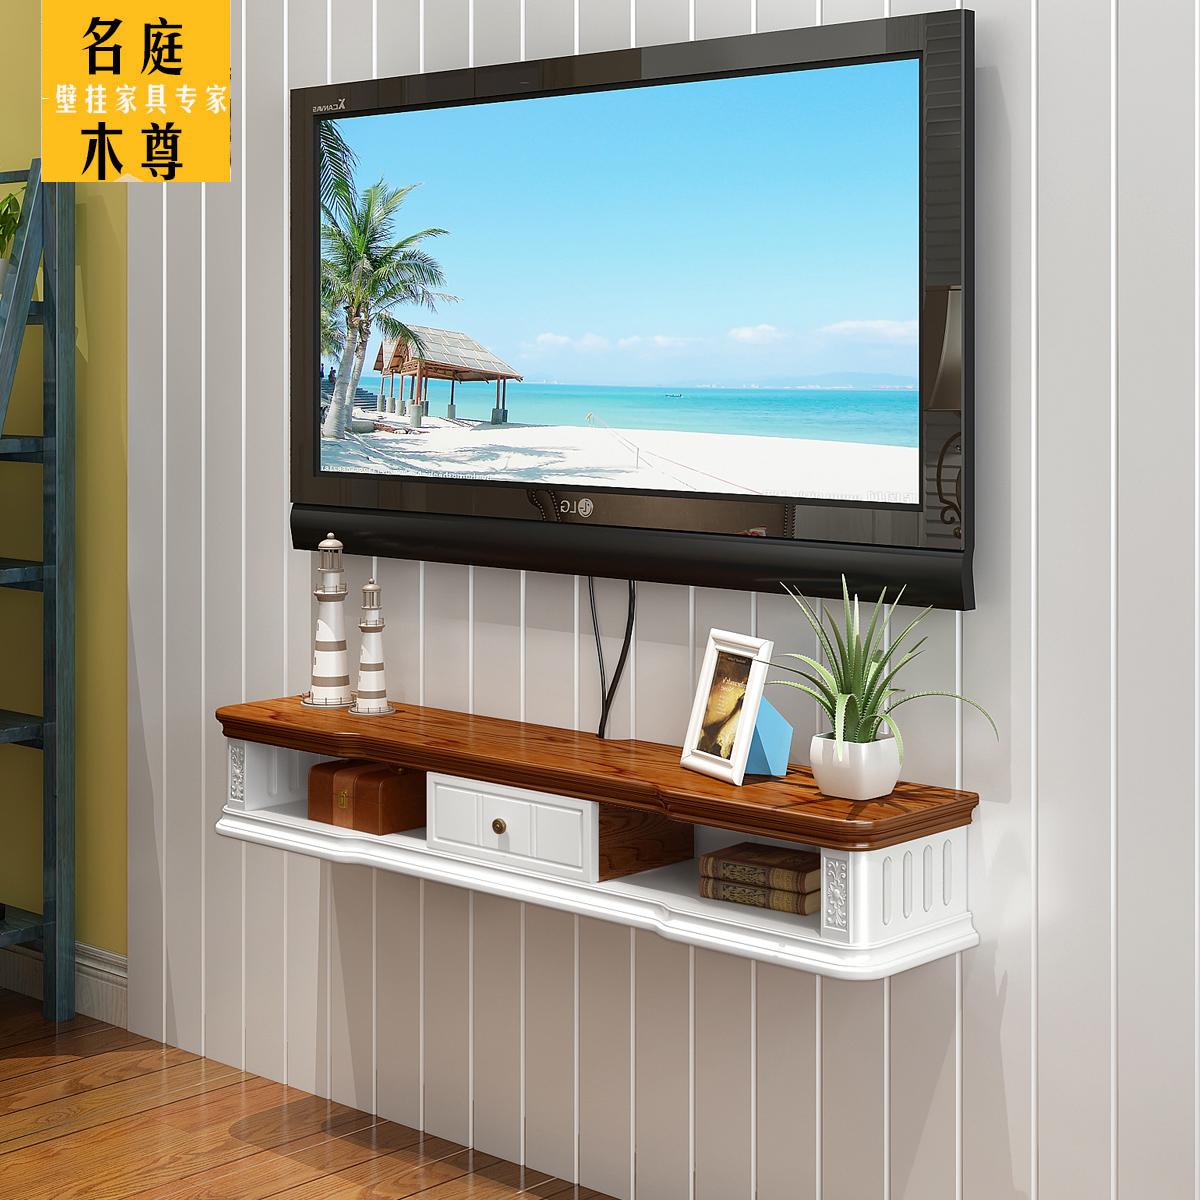 Paint European Wall Tv Cabinet Creative Set Top Box Racks Living Room Background Bedroom Simple Parion